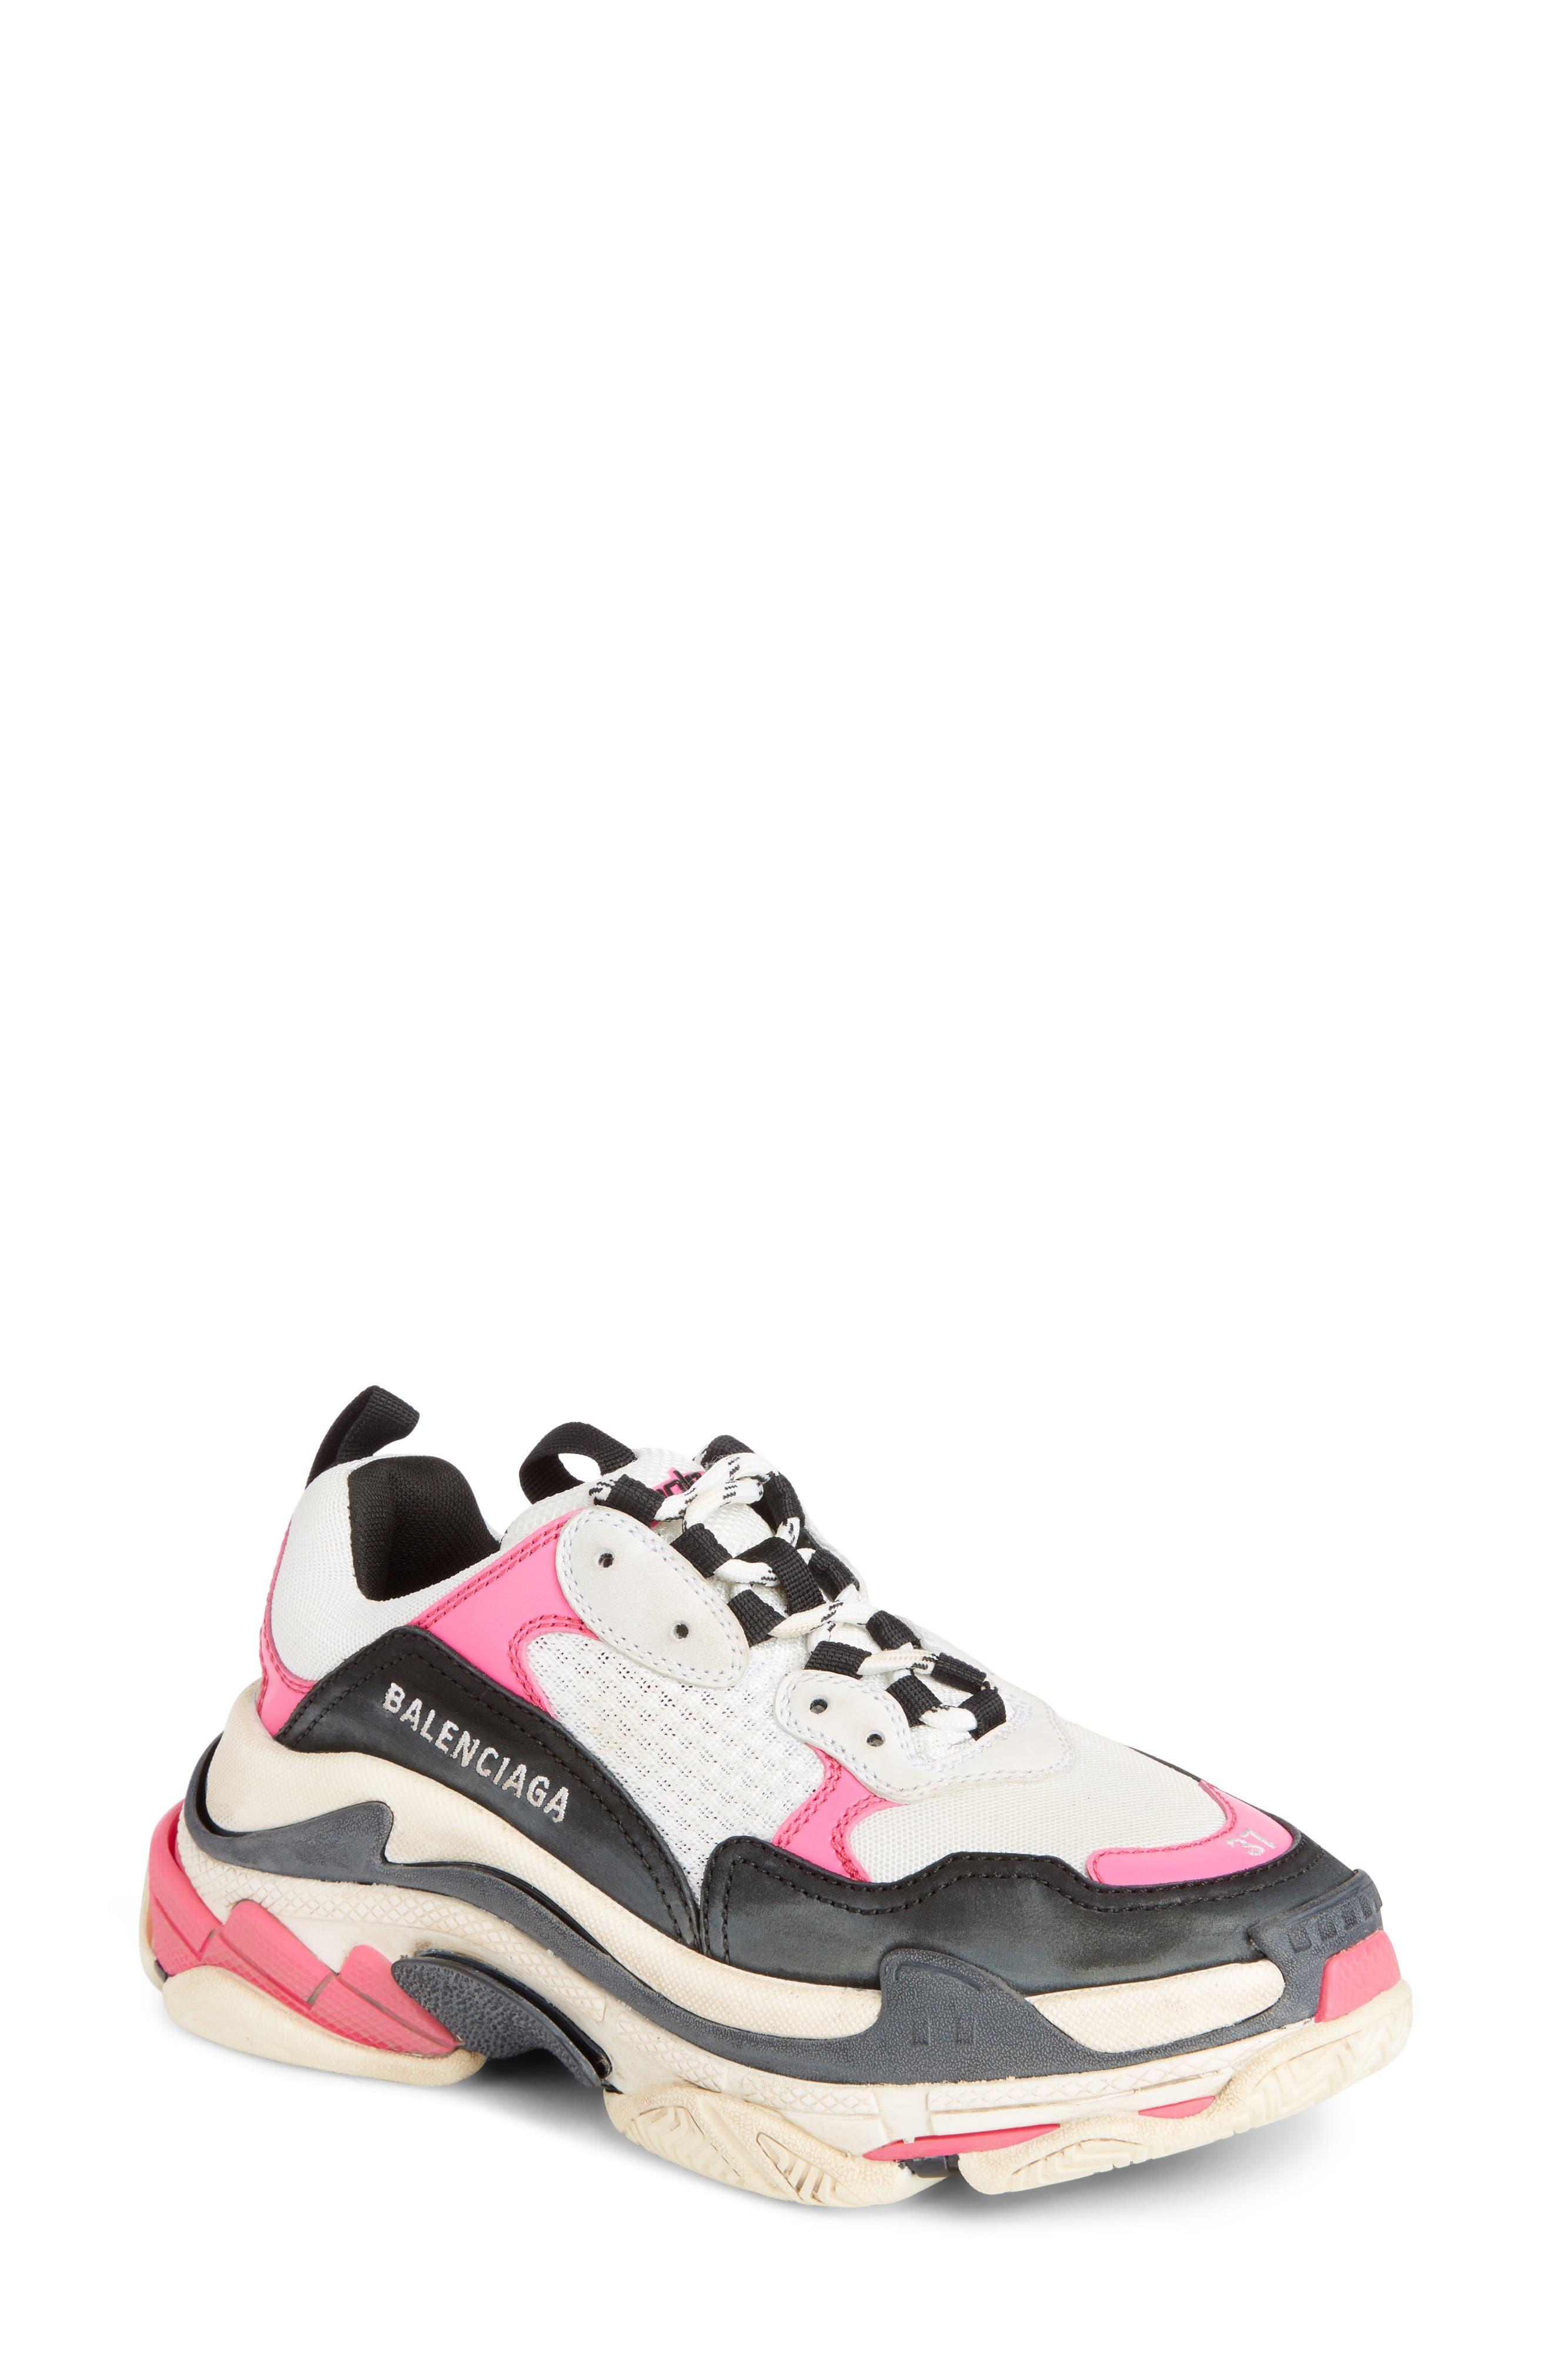 2ed7fe2fc339 Women s Balenciaga Shoes